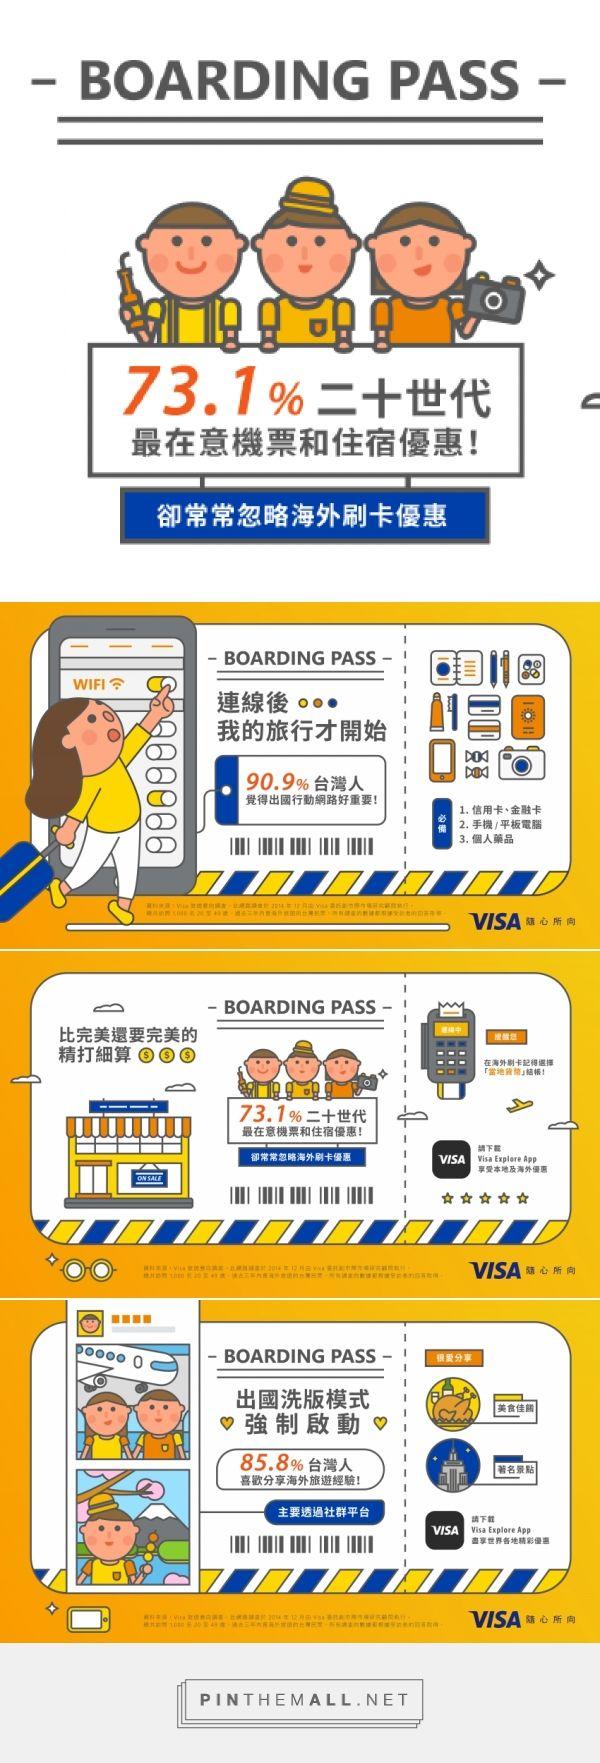 BeamMedia Visa 旅遊意向調查 - created via https://pinthemall.net